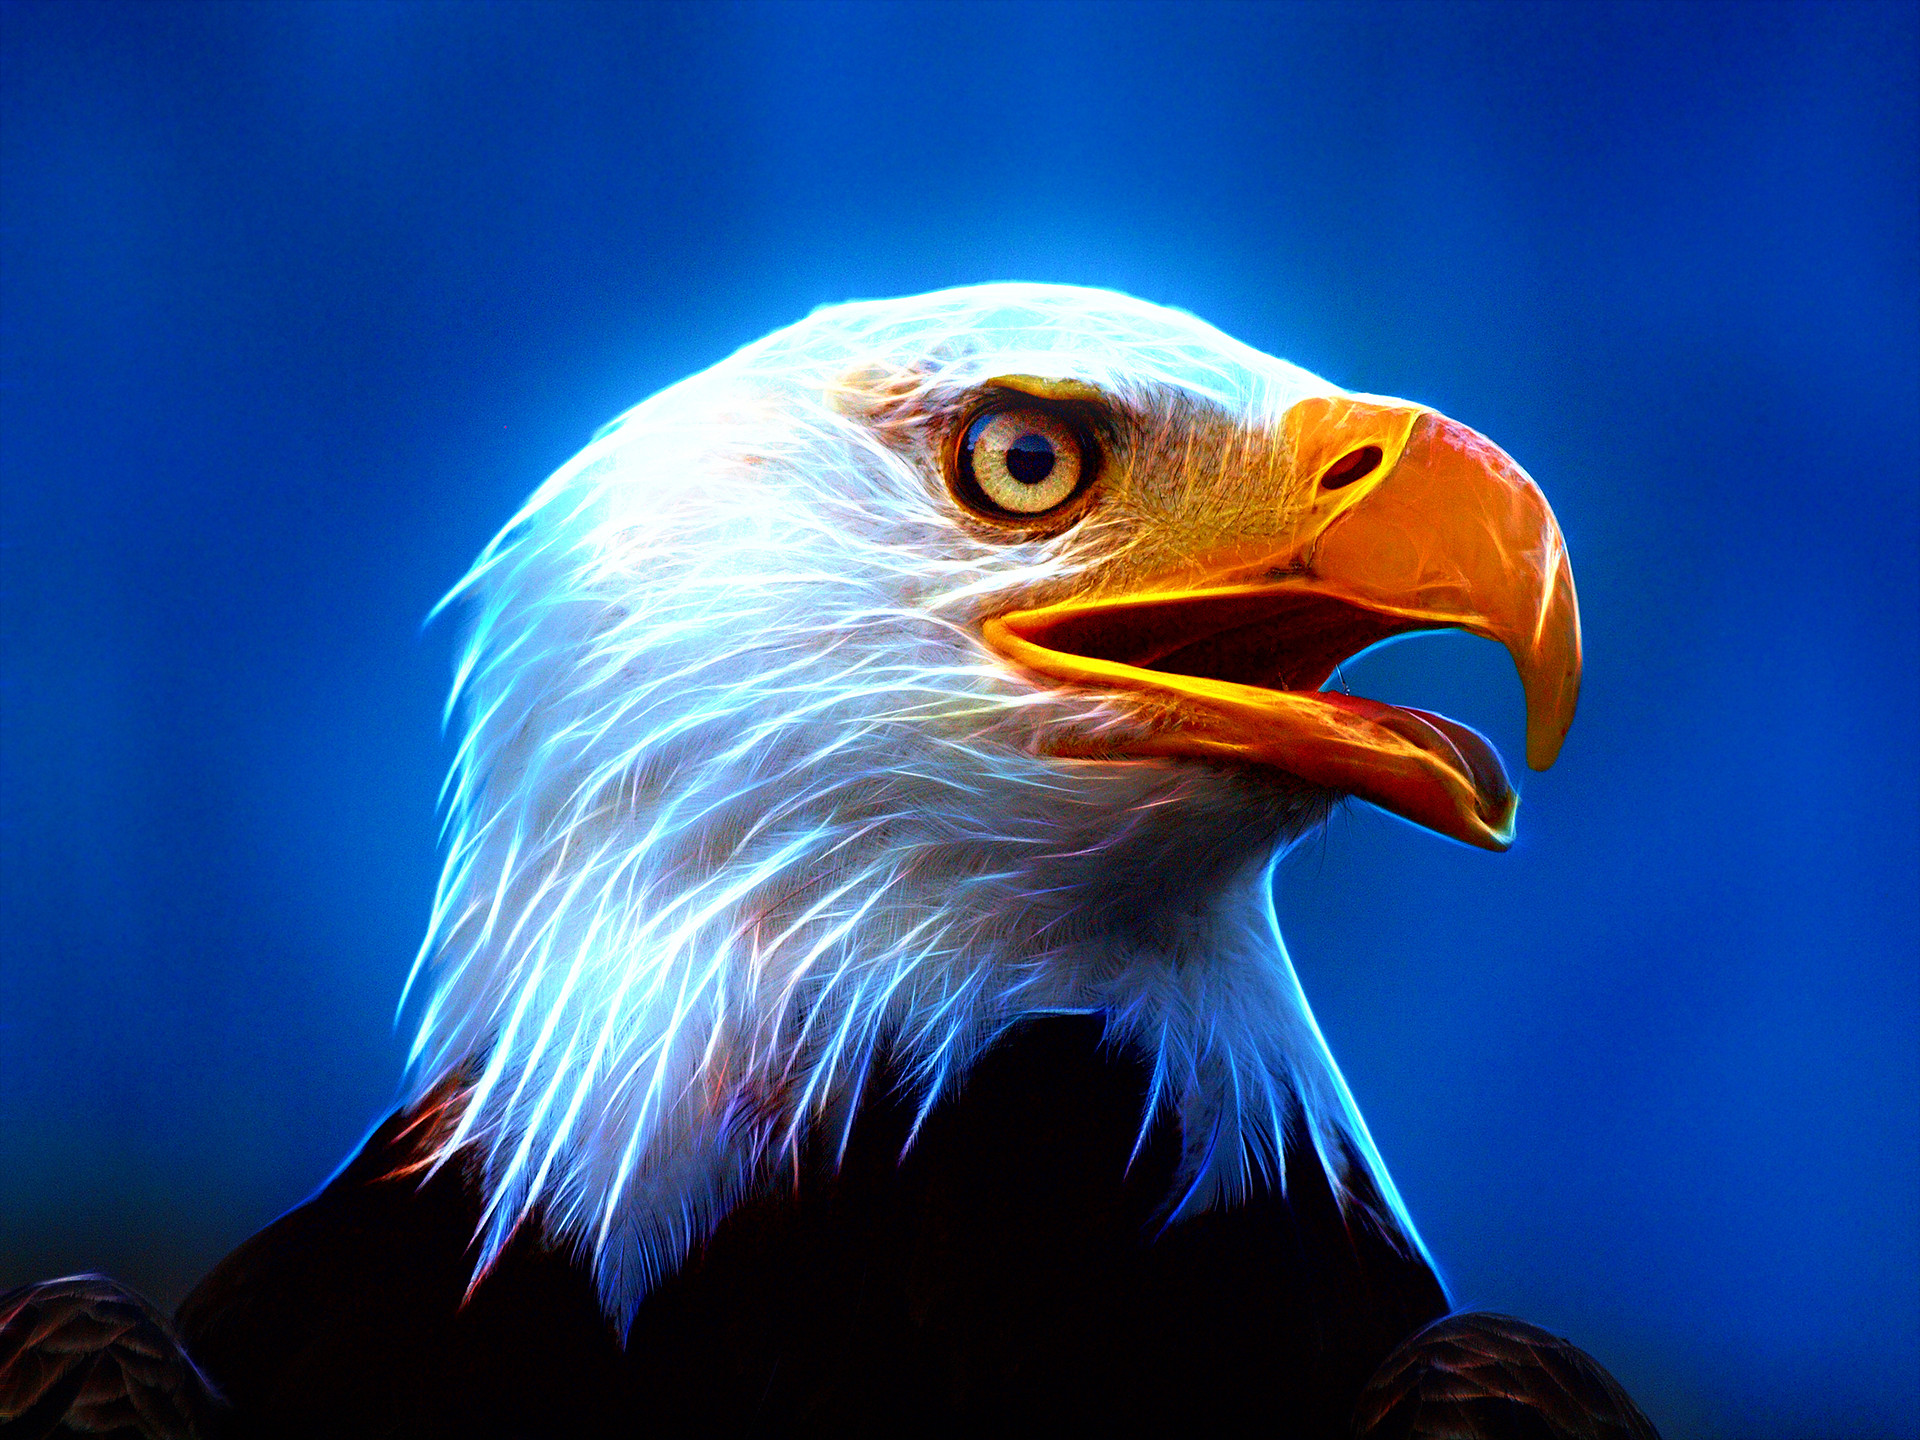 Nfl Eagles Wallpaper   HD Wallpapers   Pinterest   Wallpaper and deviantART